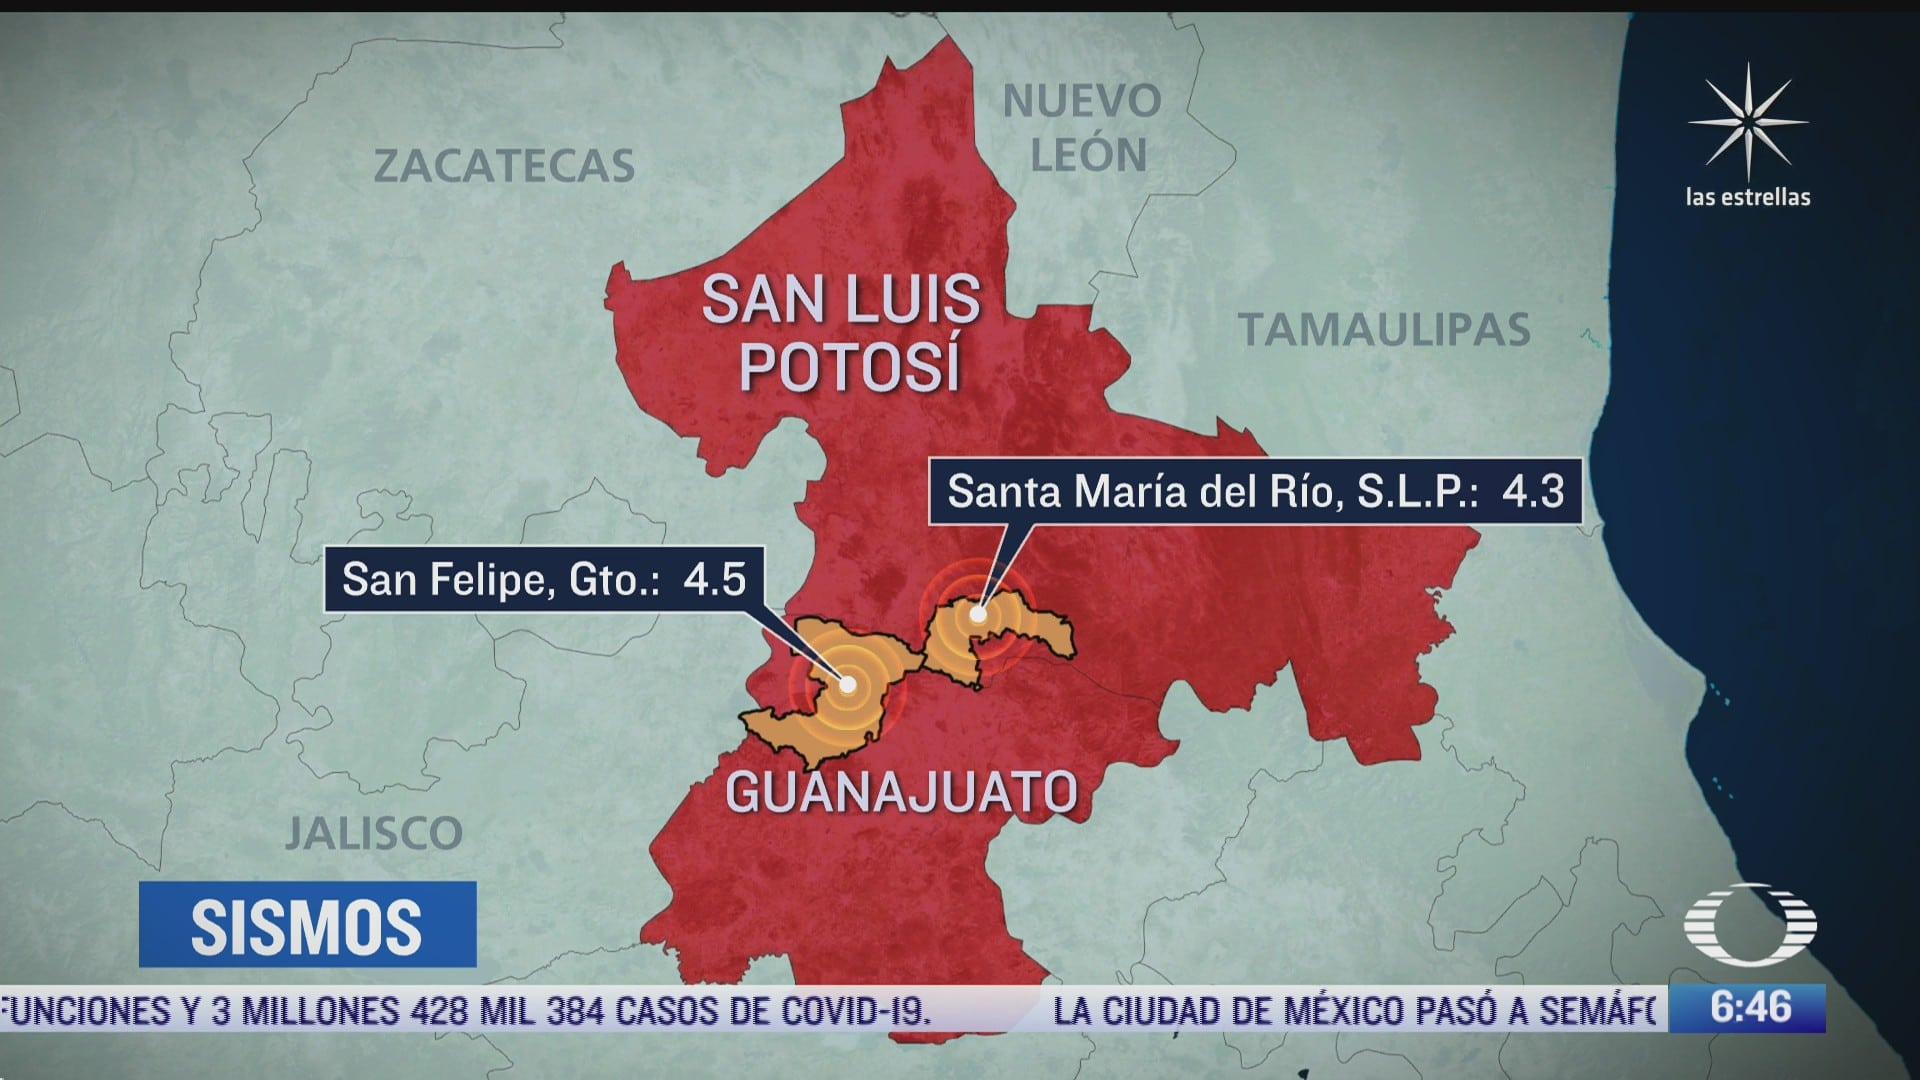 falso rumor tras sismo en guanajuato provoca panico entre la poblacion